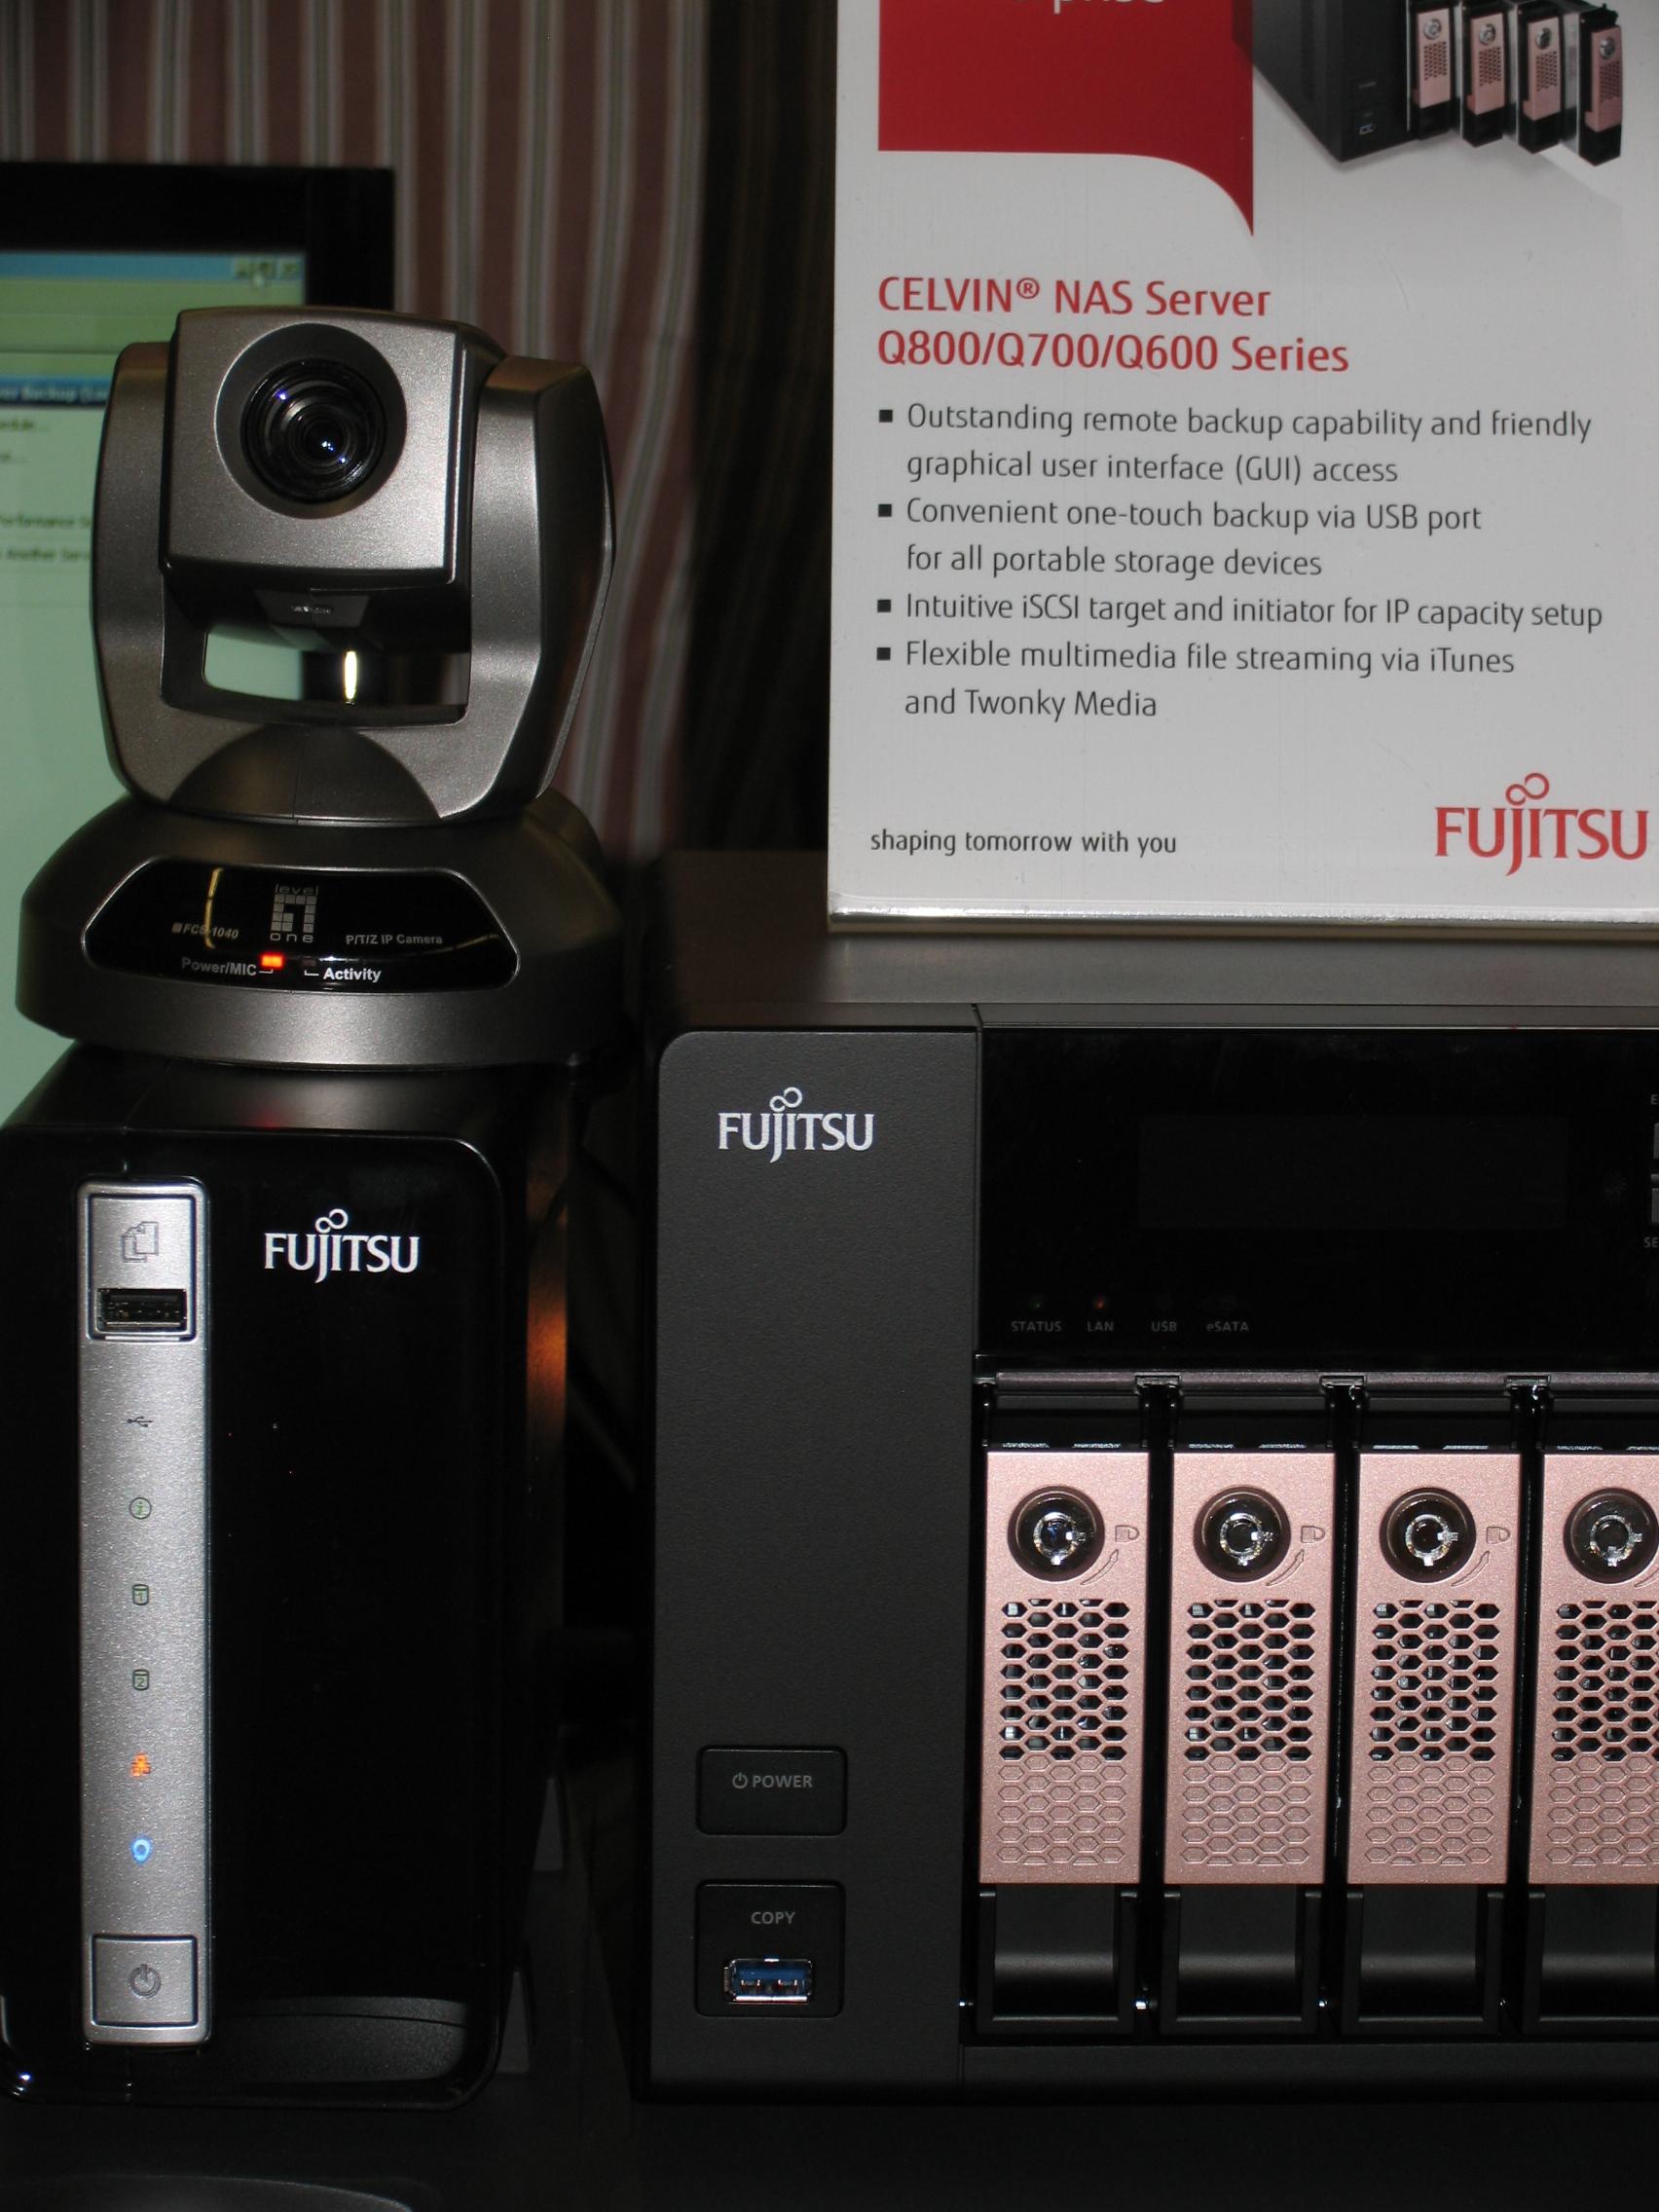 Fujitsu: Visit 2010